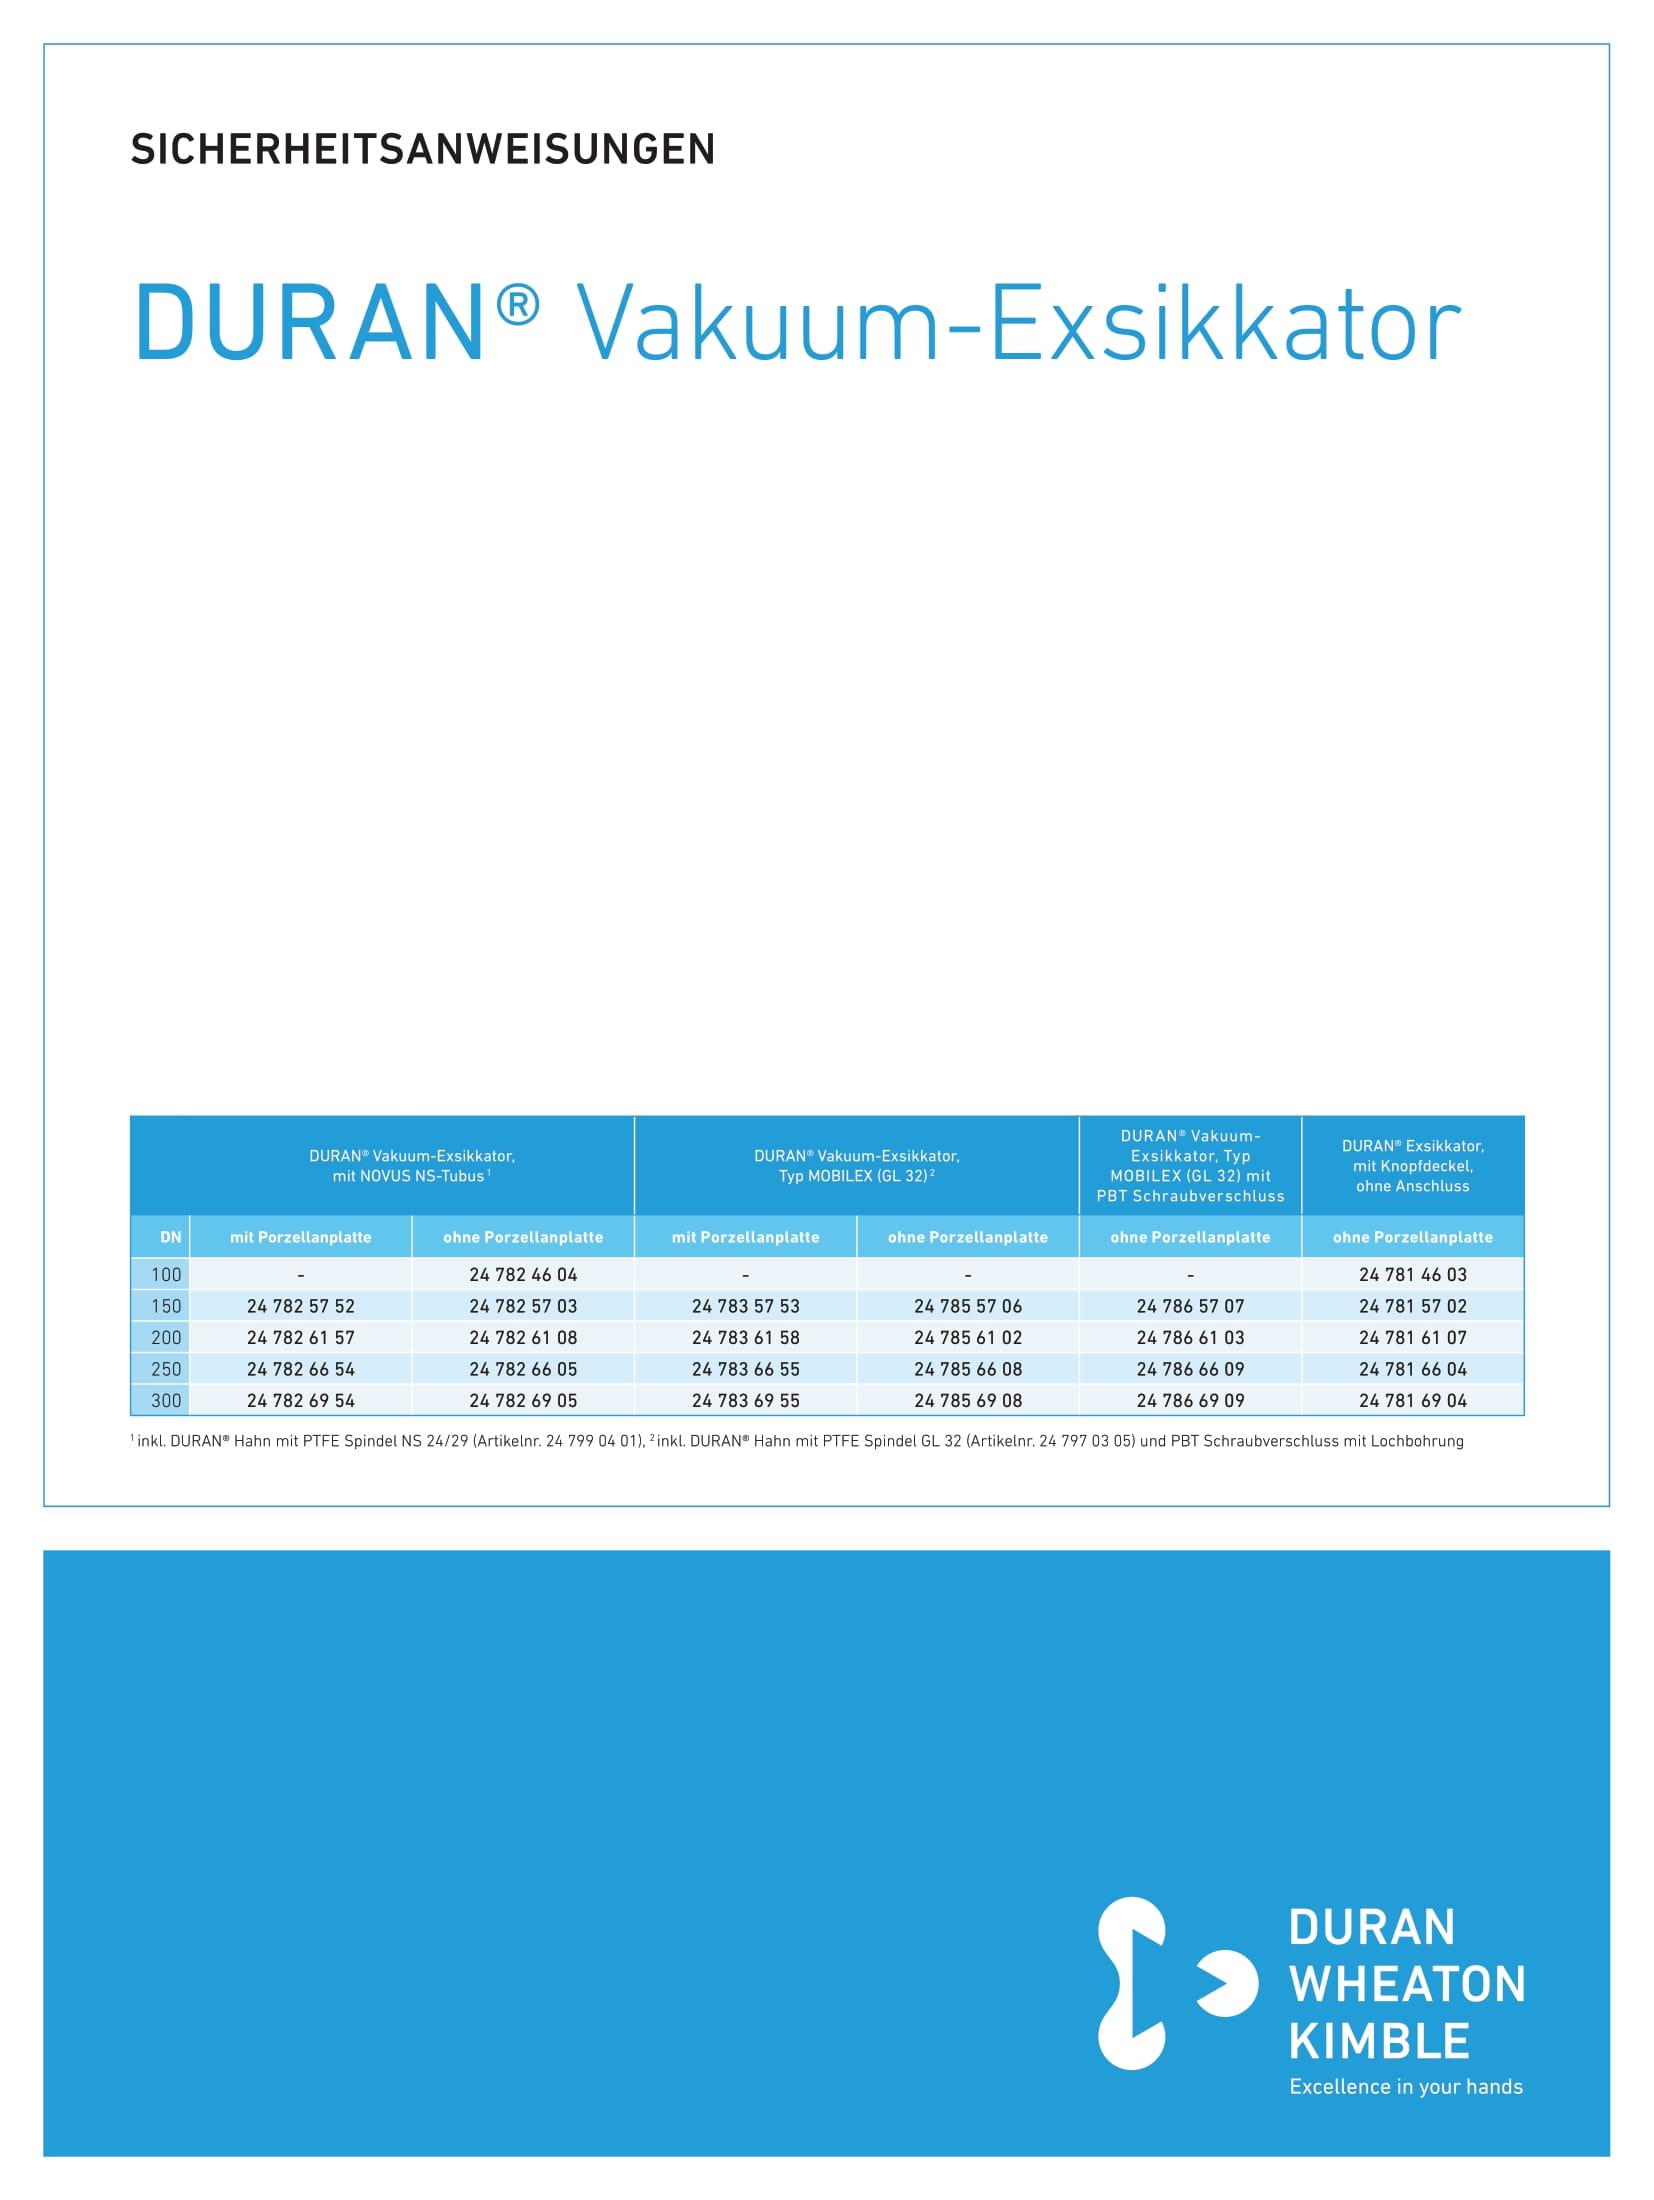 DWK SAFETY INSTRUCTIONS DURAN® Vacuum Desiccator